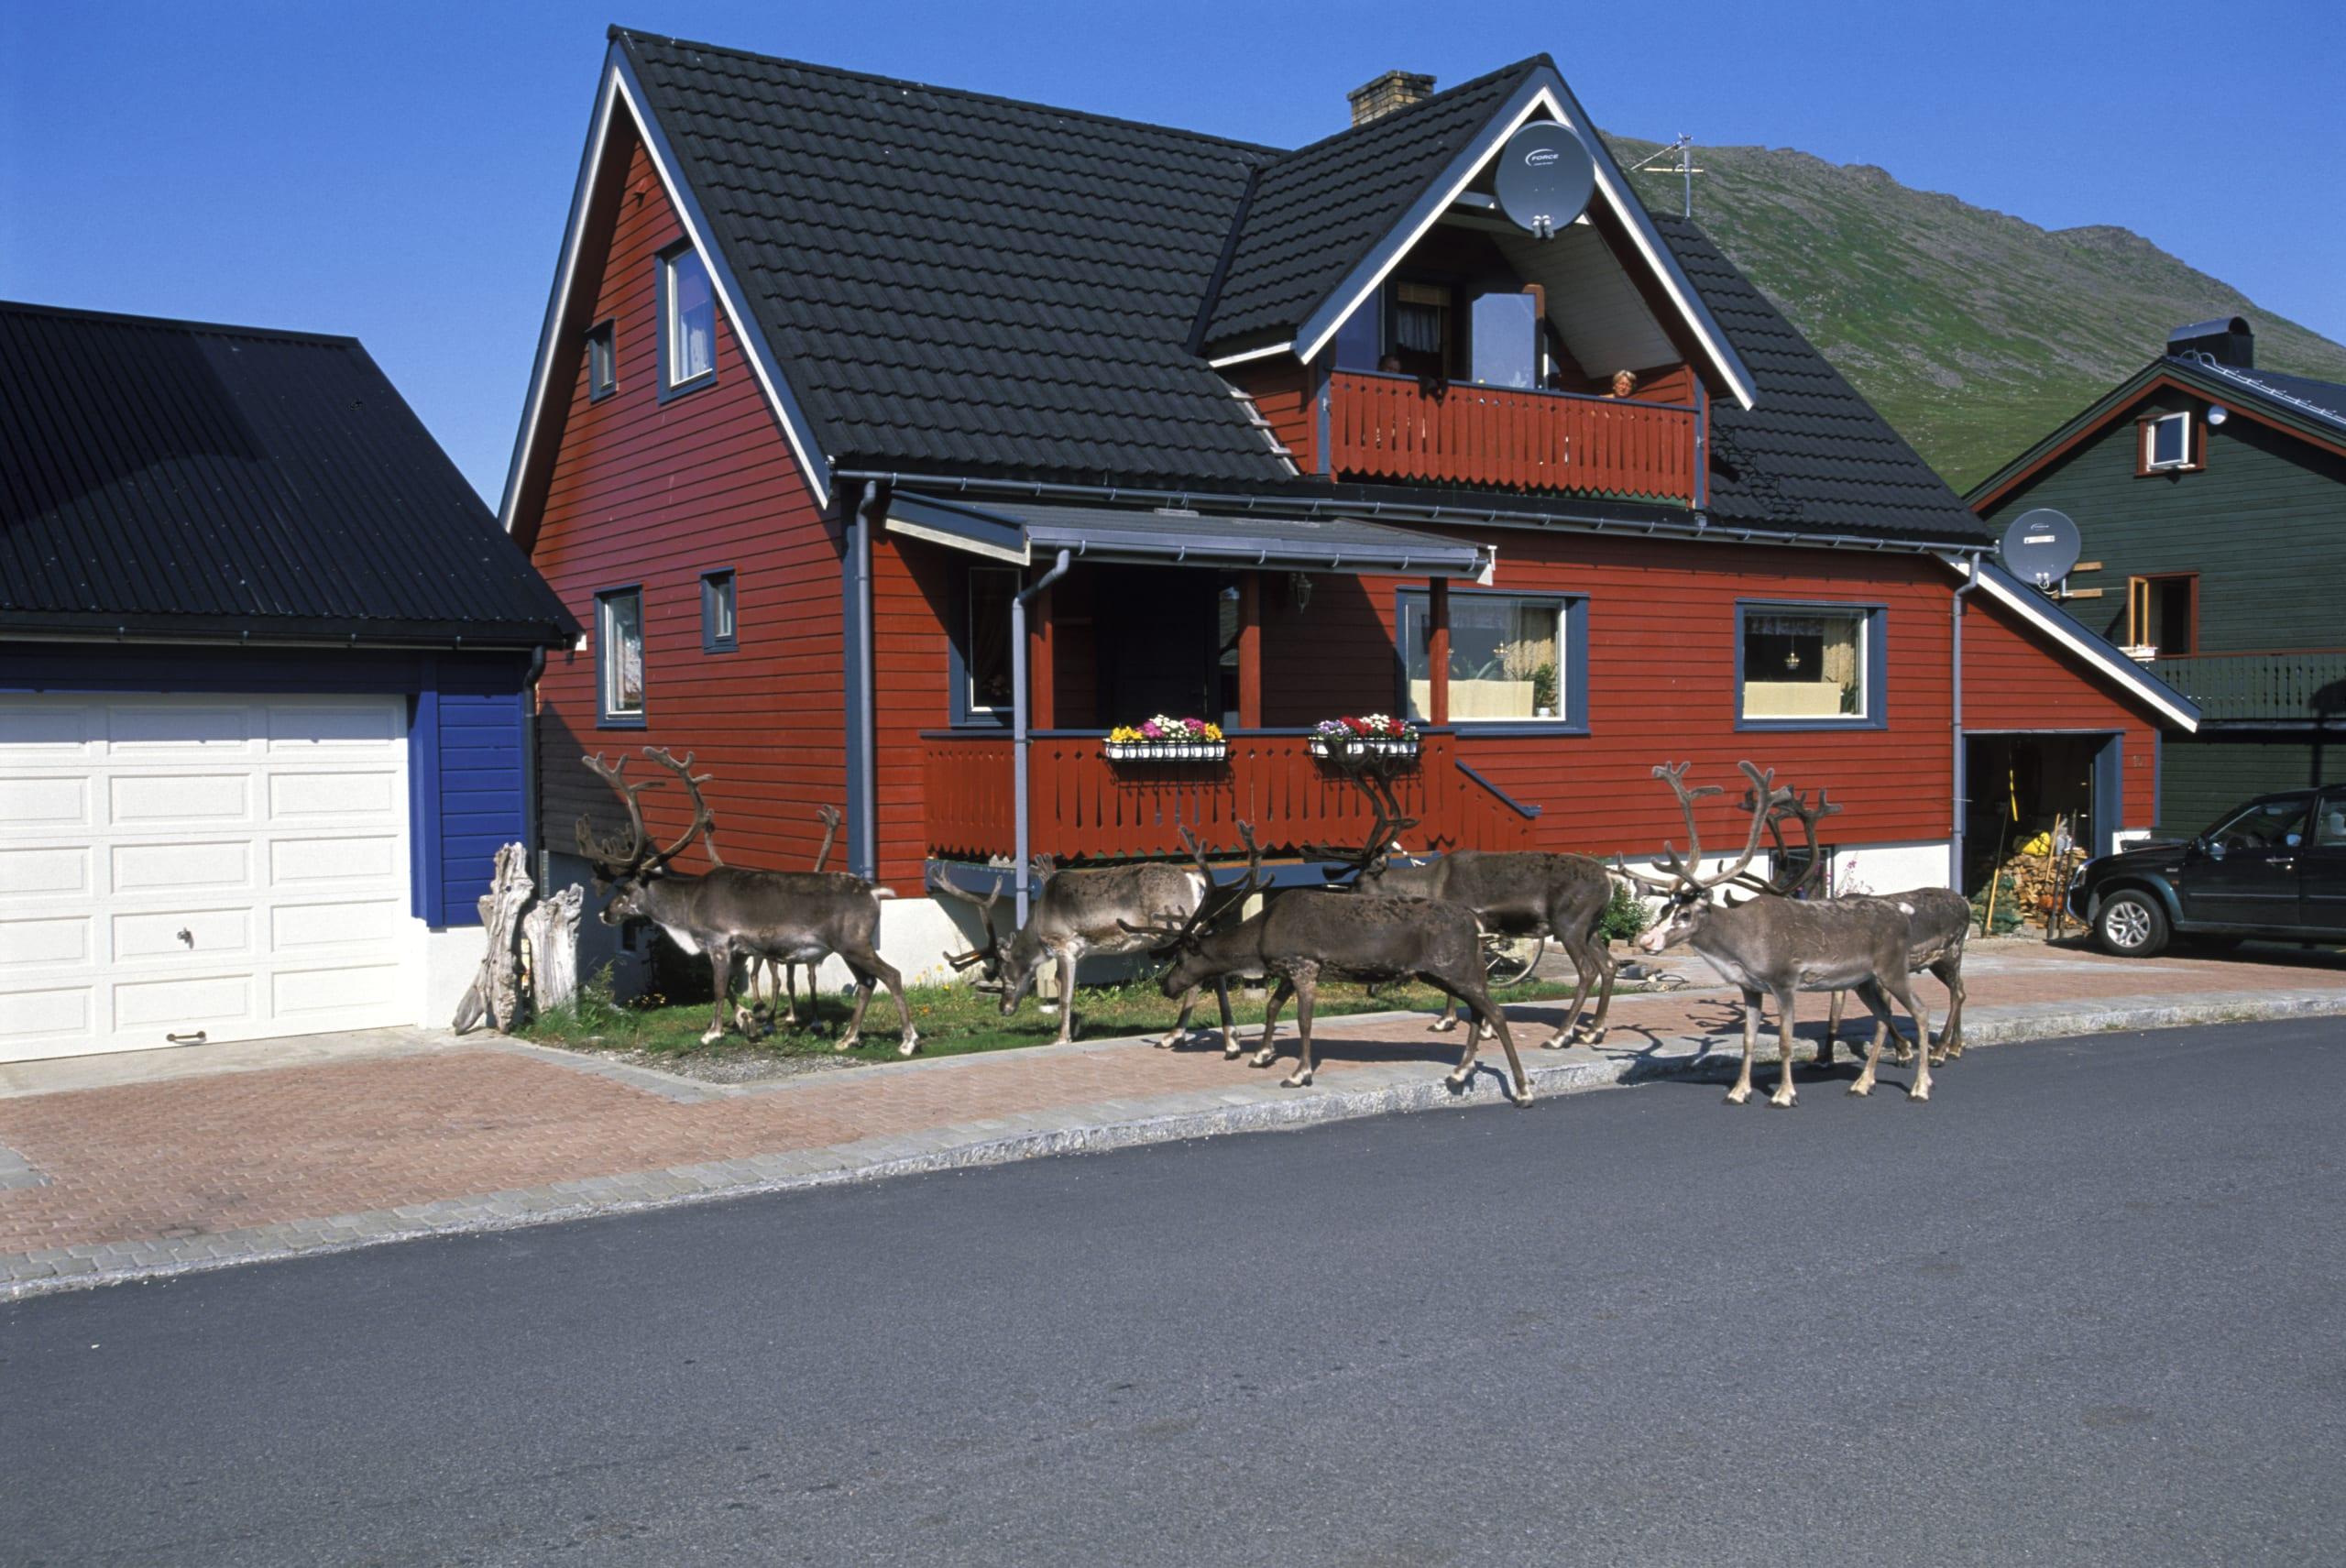 Reindeer feeding in the town of Honningsvær